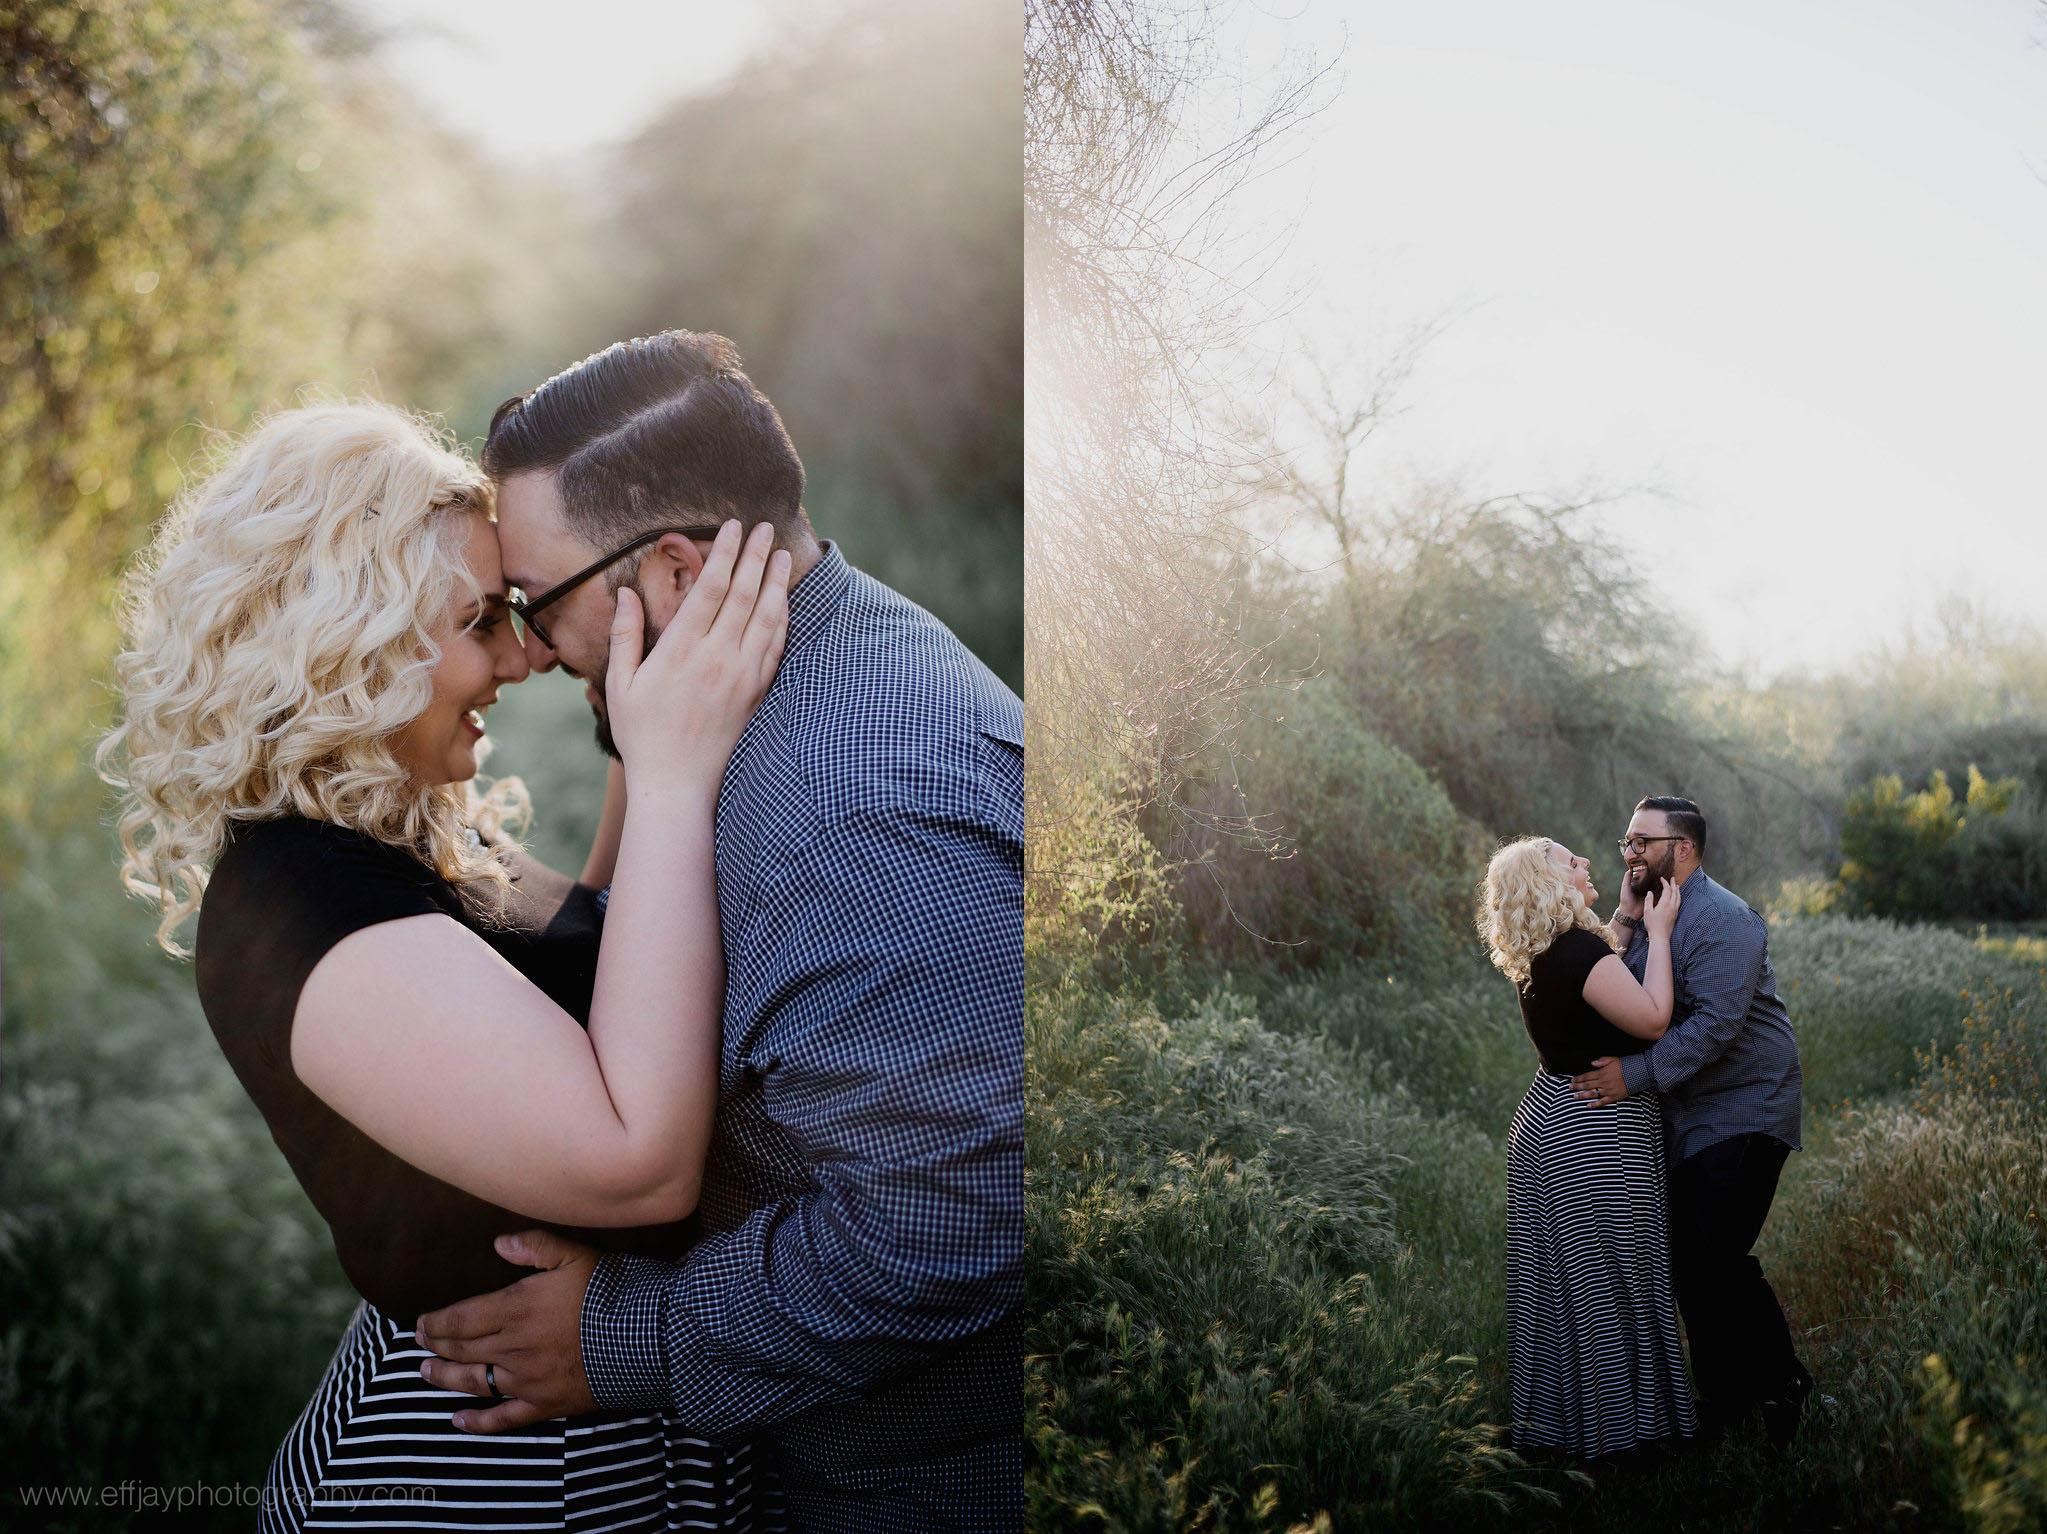 Austin Wedding Photographer Destination Arizona Desert Engagement Session003.jpg